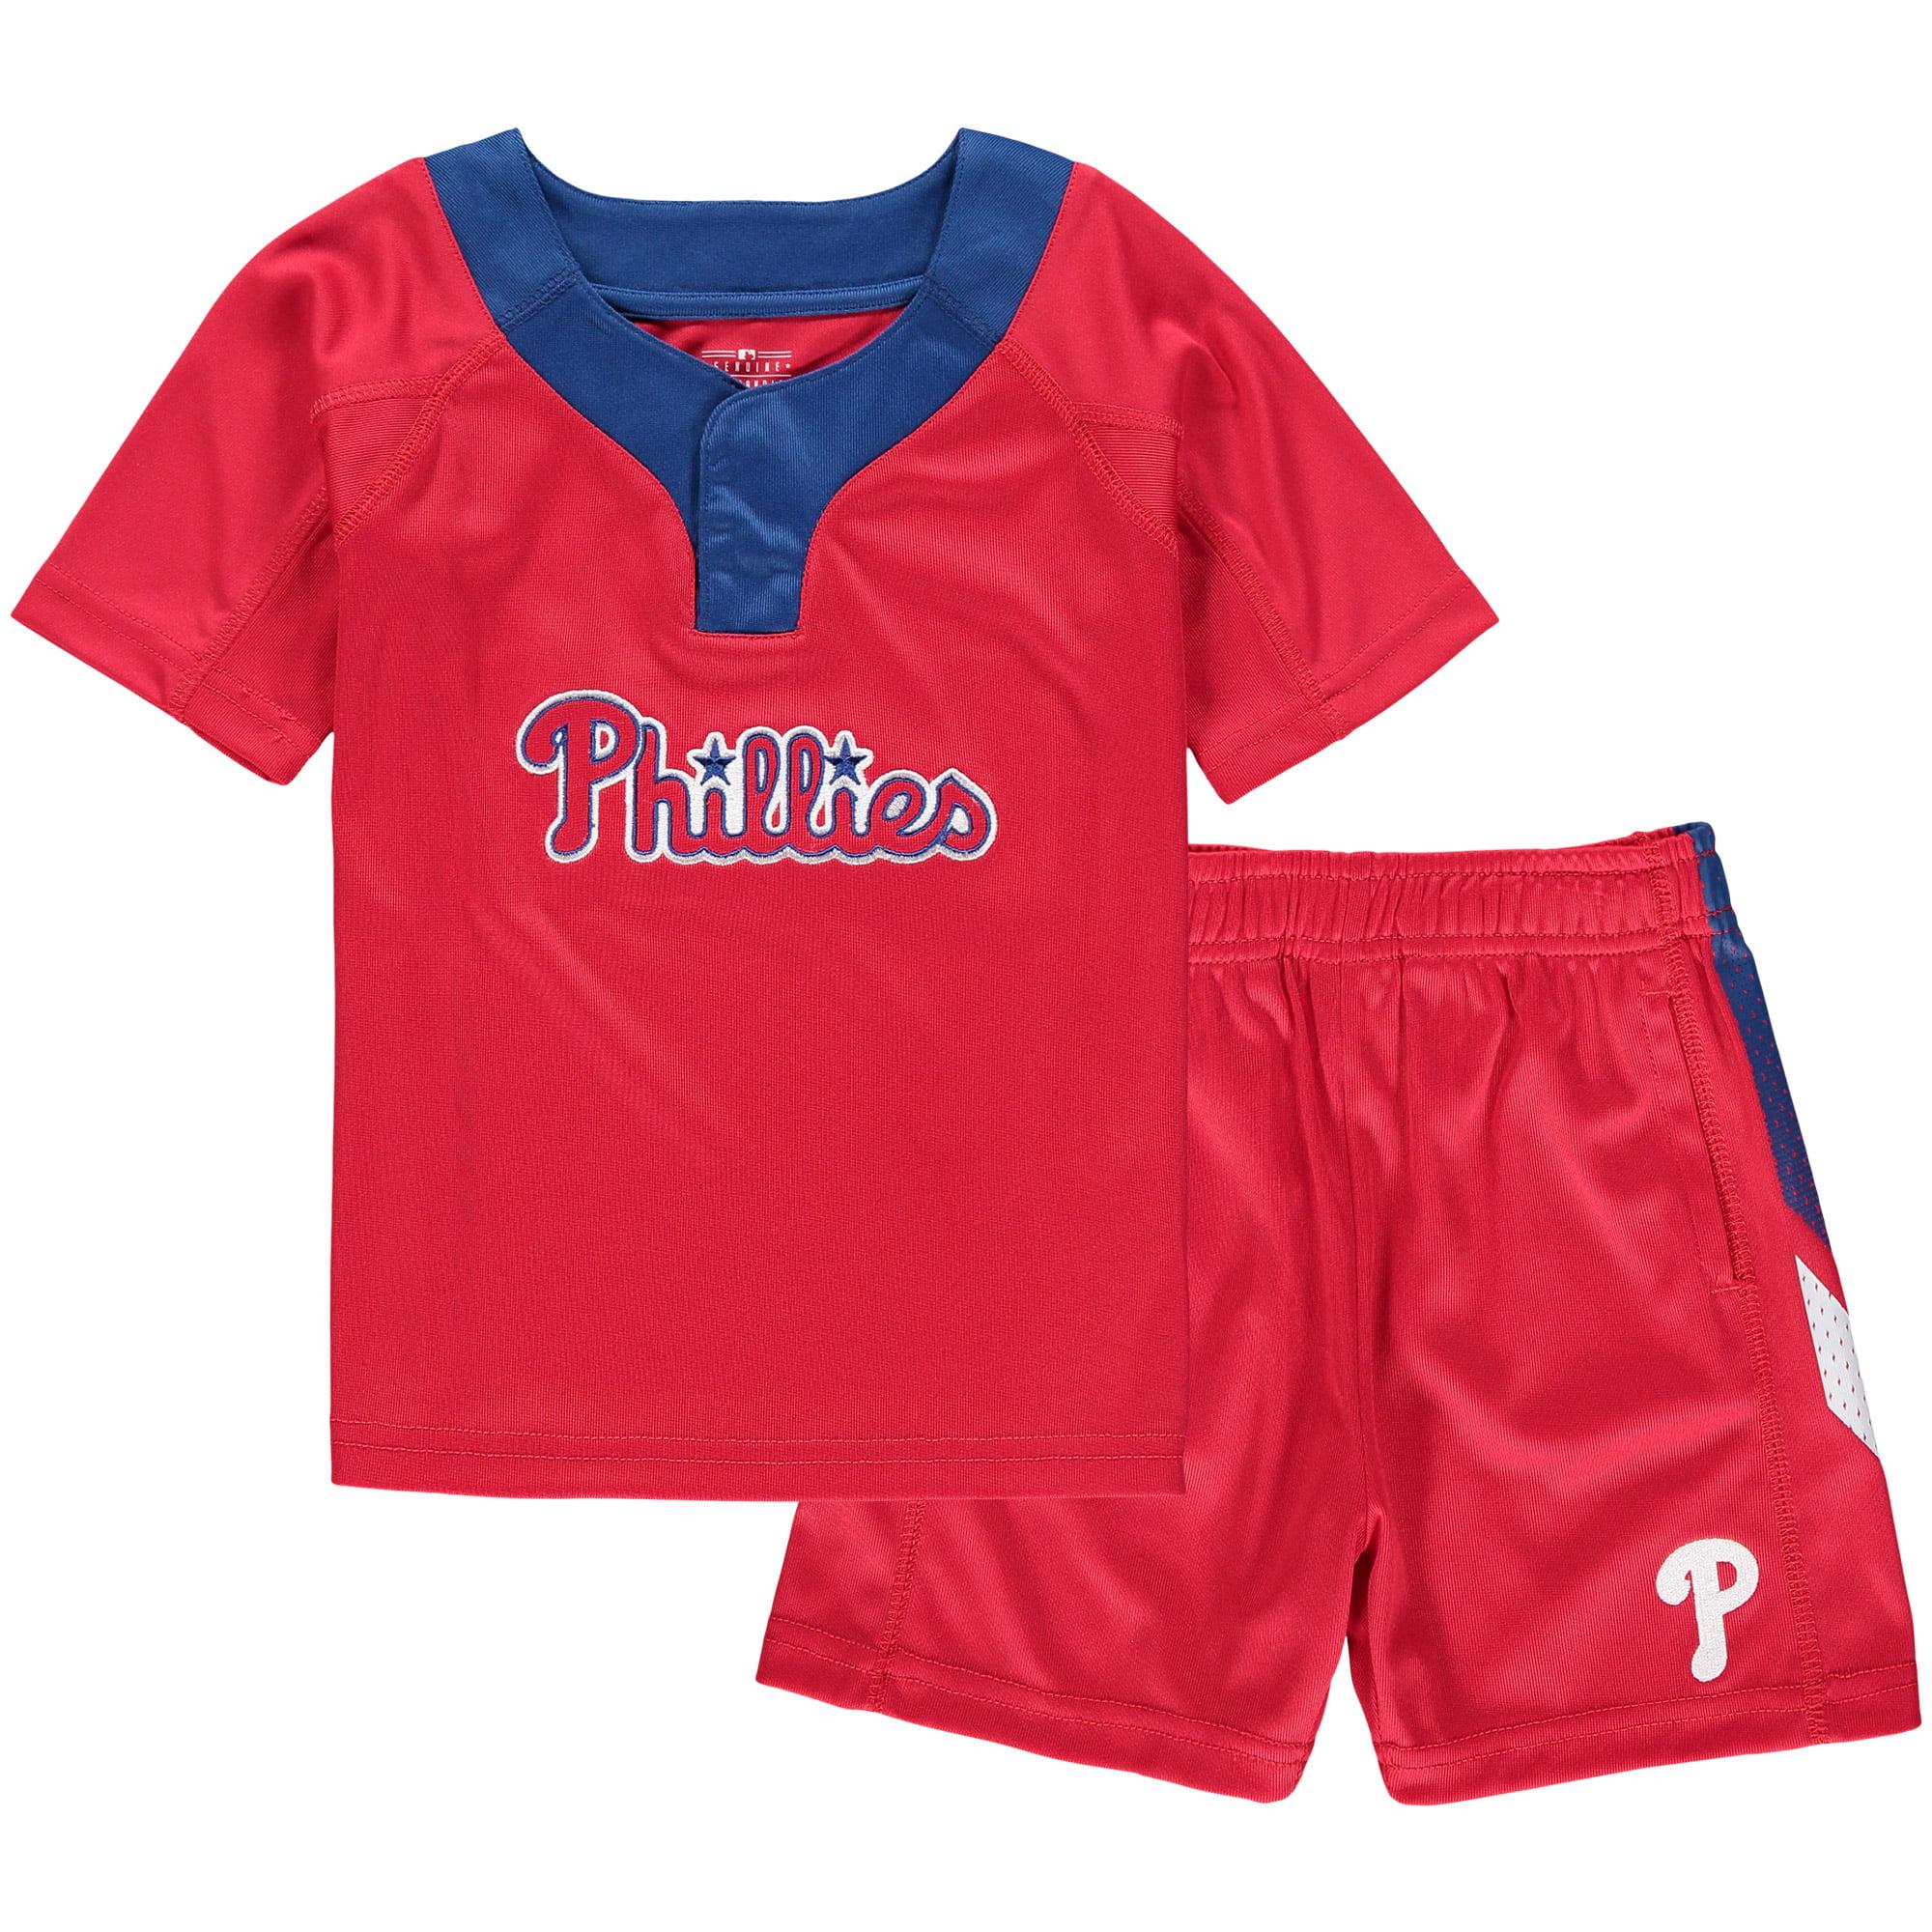 Philadelphia Phillies Toddler Ground Rules T-Shirt & Shorts Set - Red/Royal